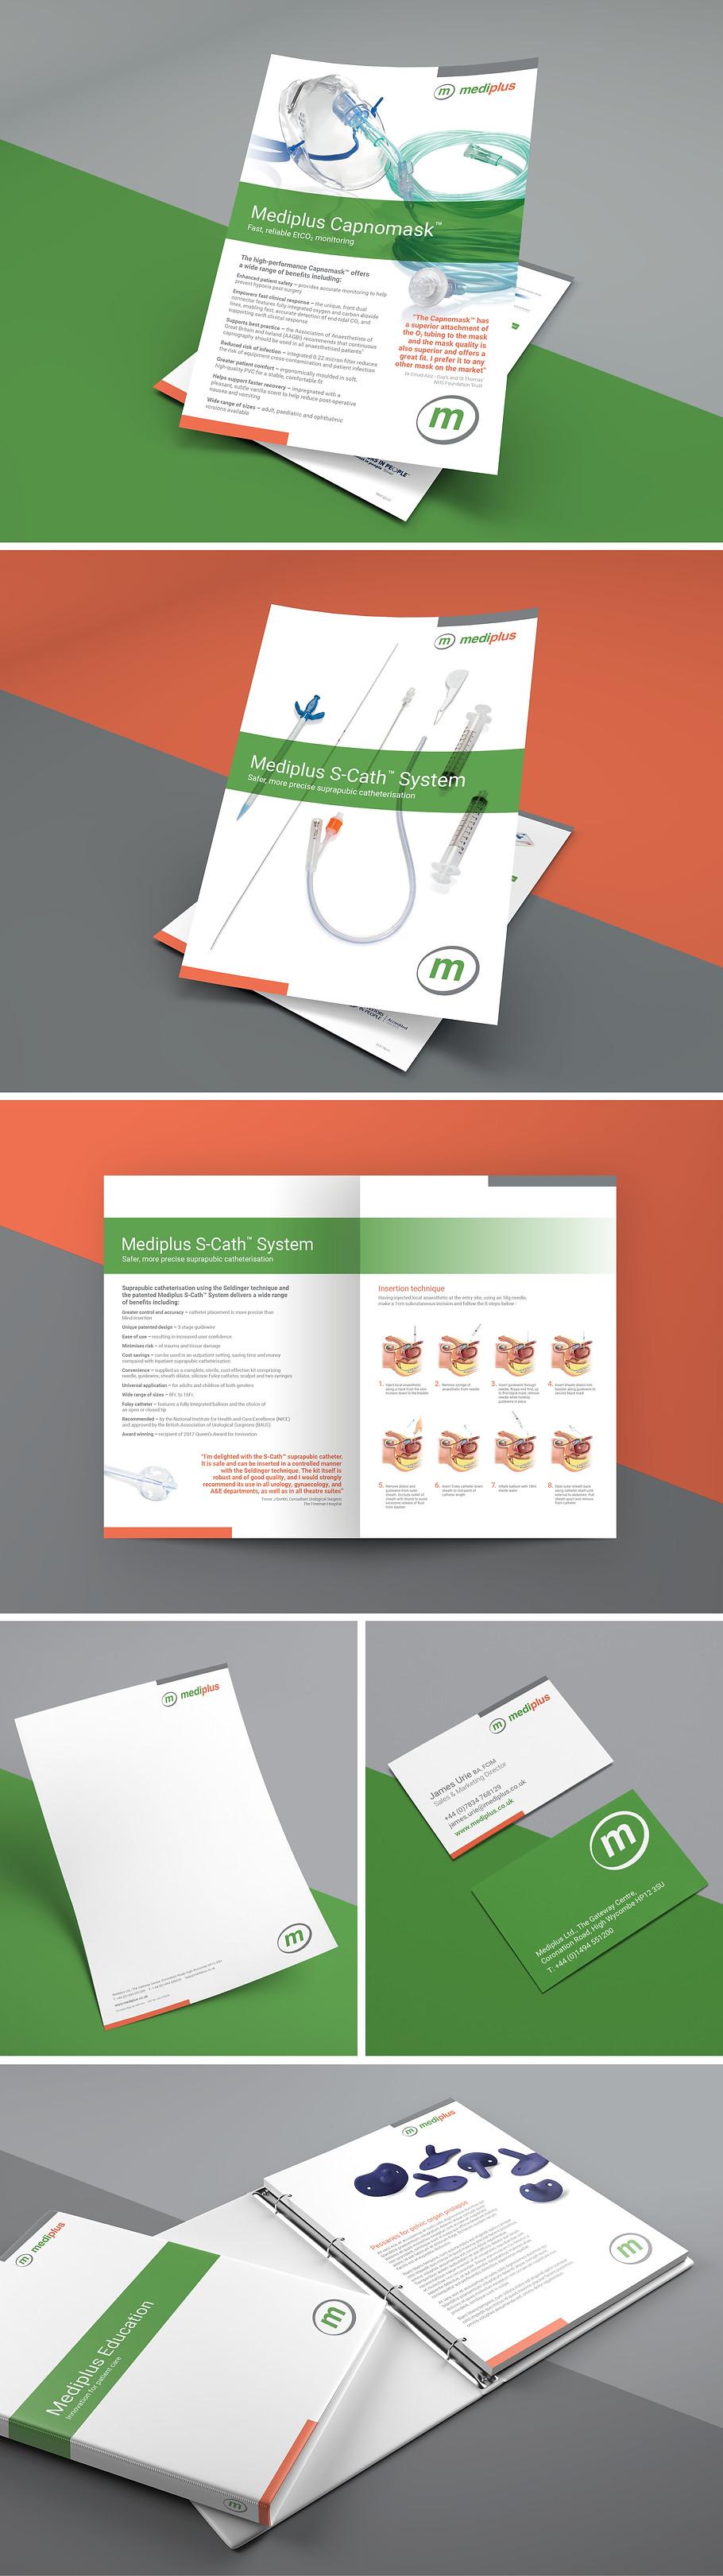 KOM Design | Mediplus